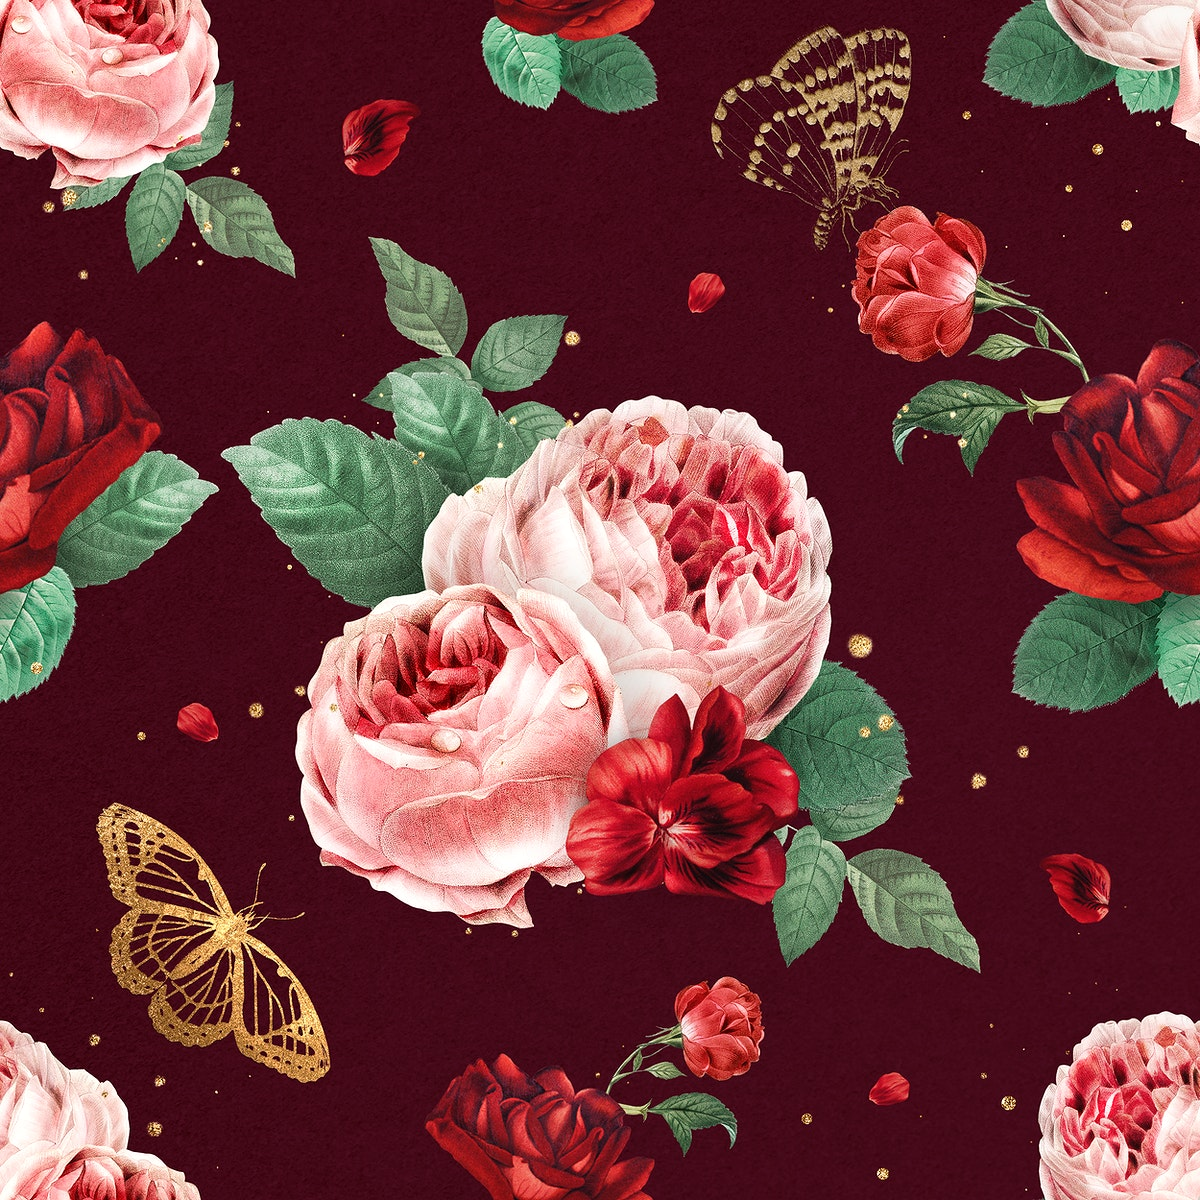 Red peony flowers watercolor pattern vintage